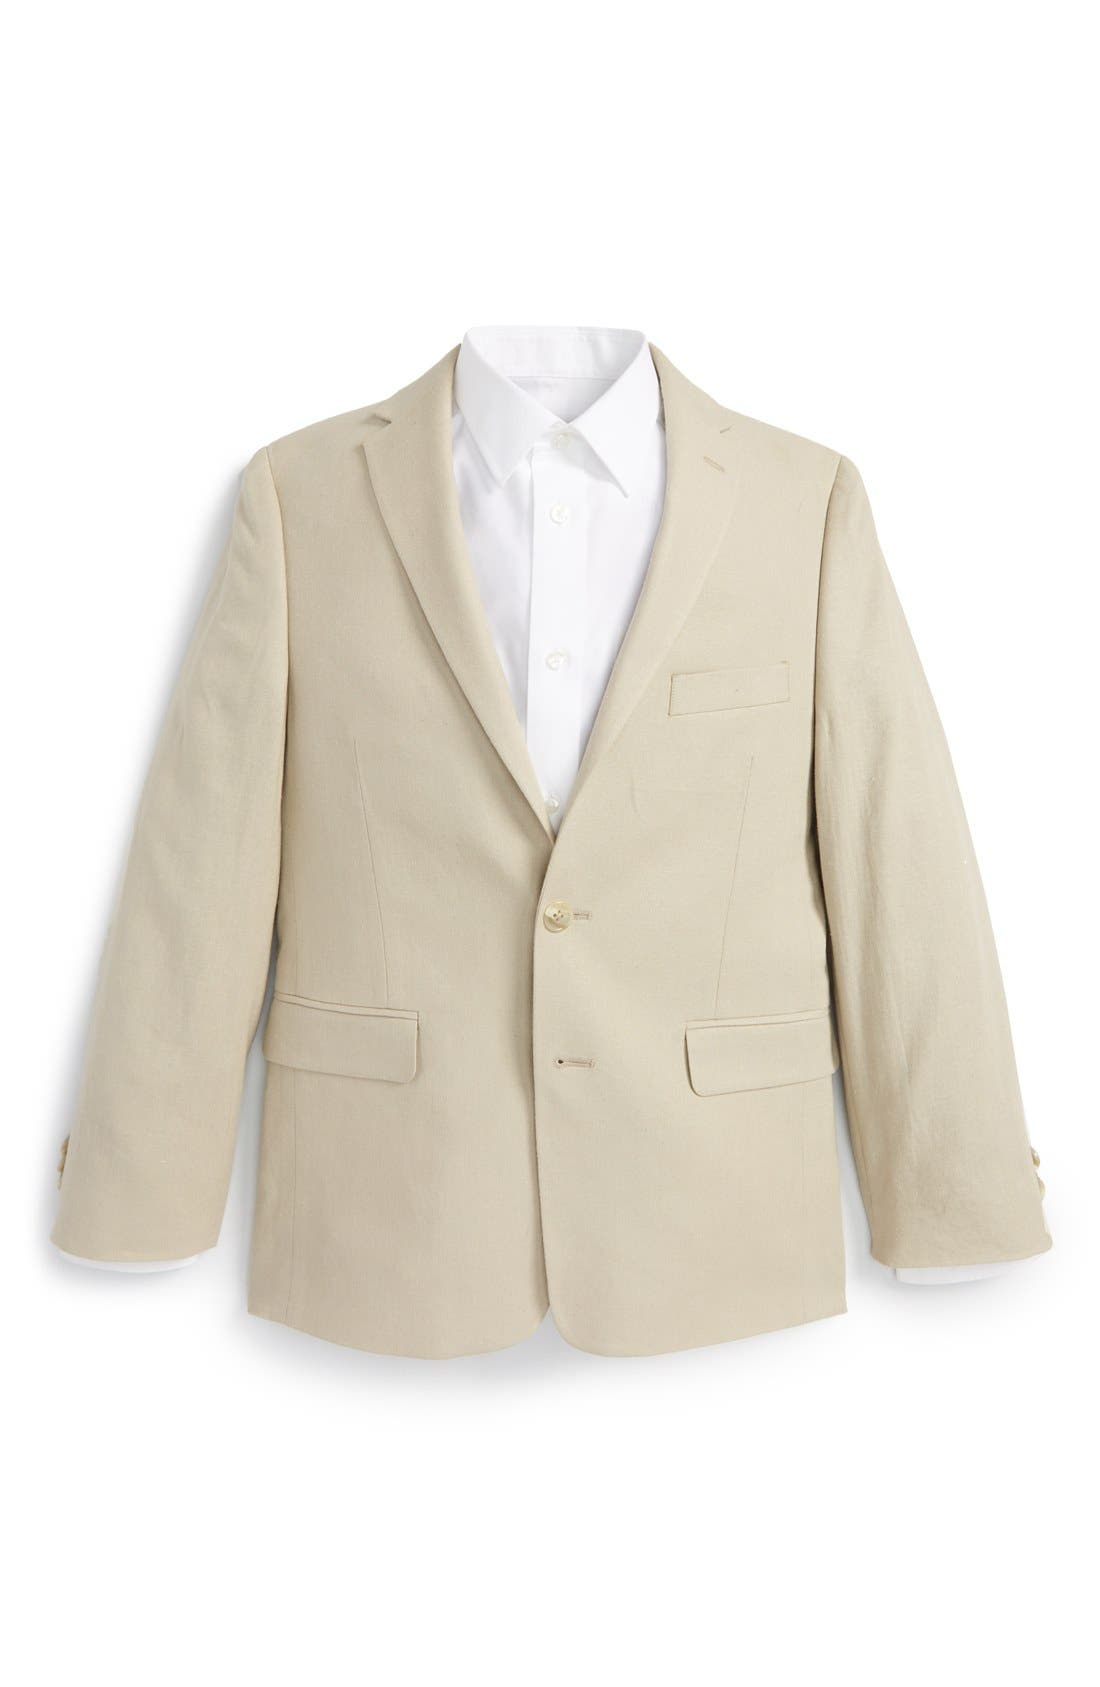 MICHAEL KORS, Linen Blend Blazer, Main thumbnail 1, color, TAN